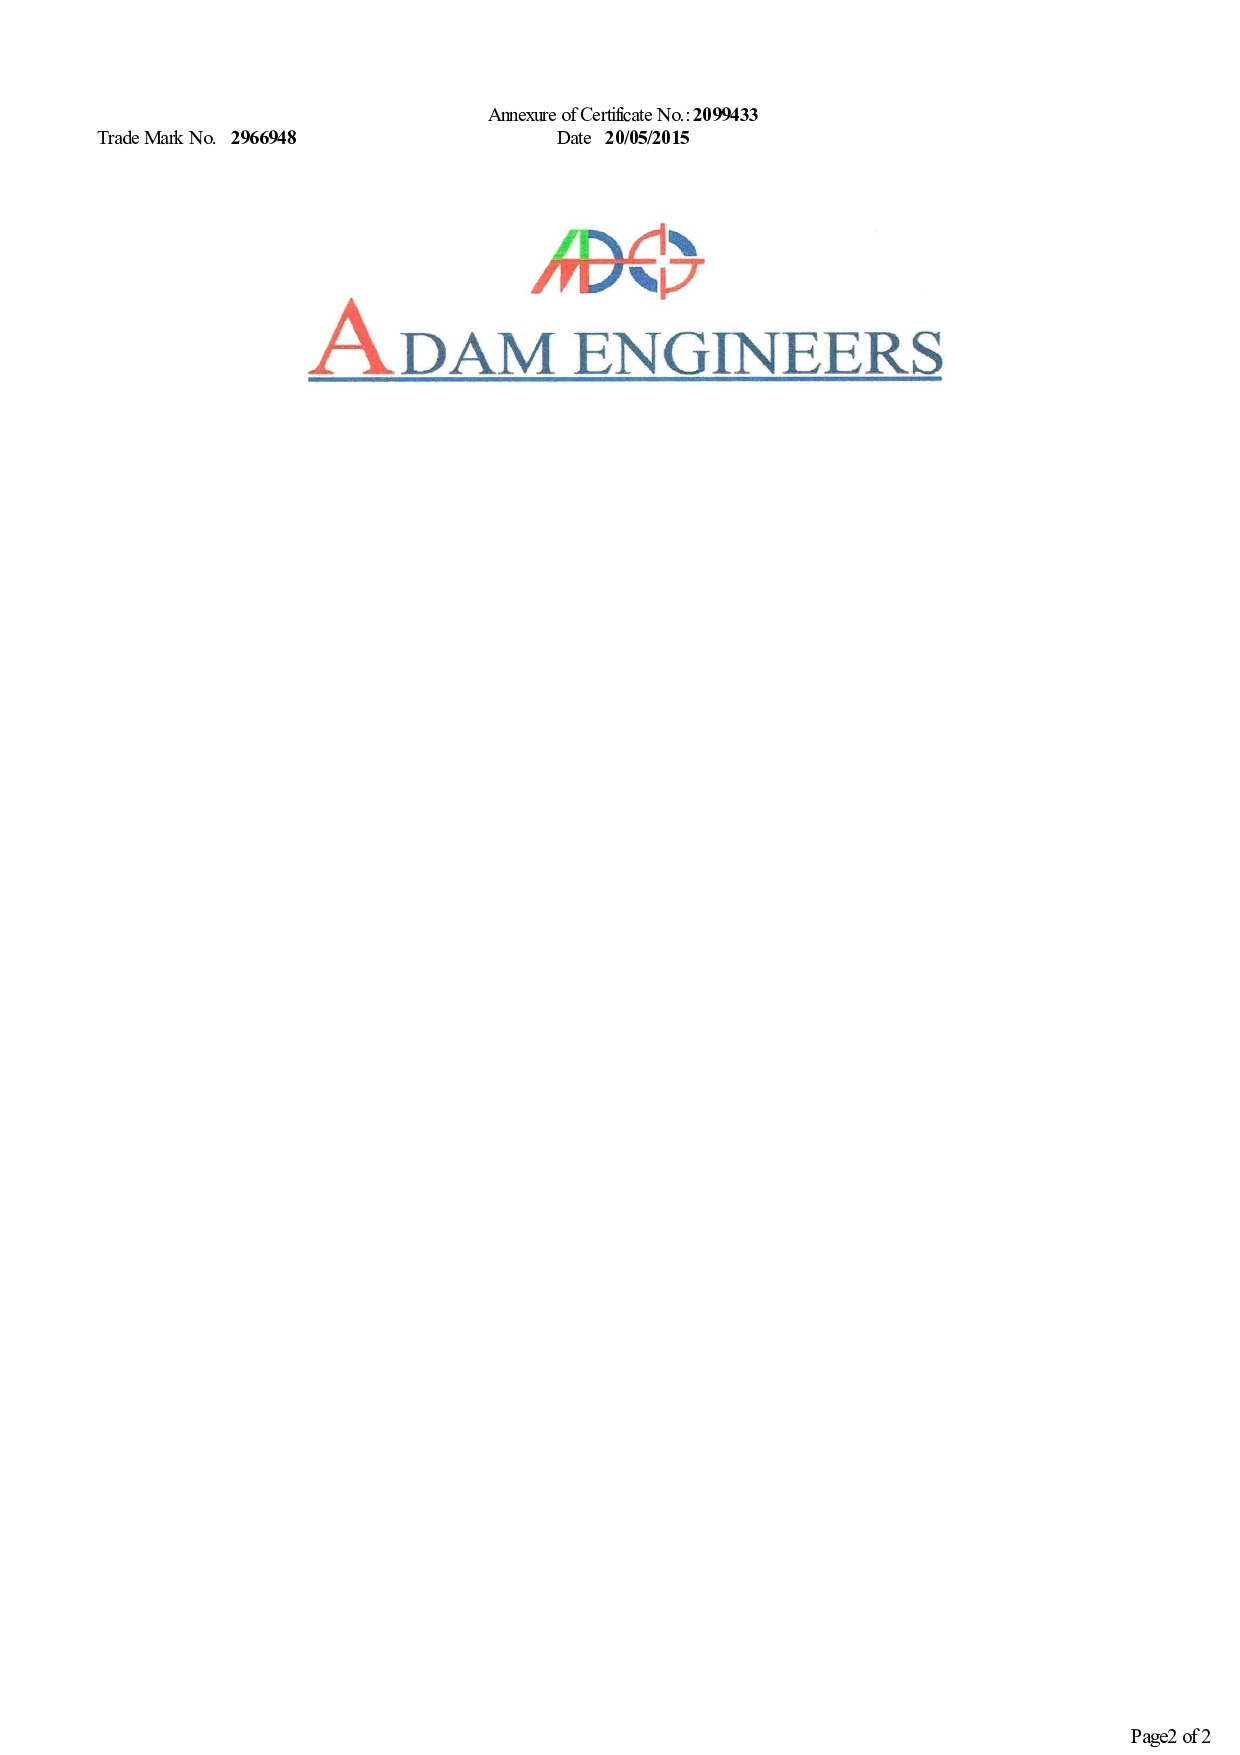 ADAM_ENGINEER_TRADE_MARK_CERTIFICATE_1